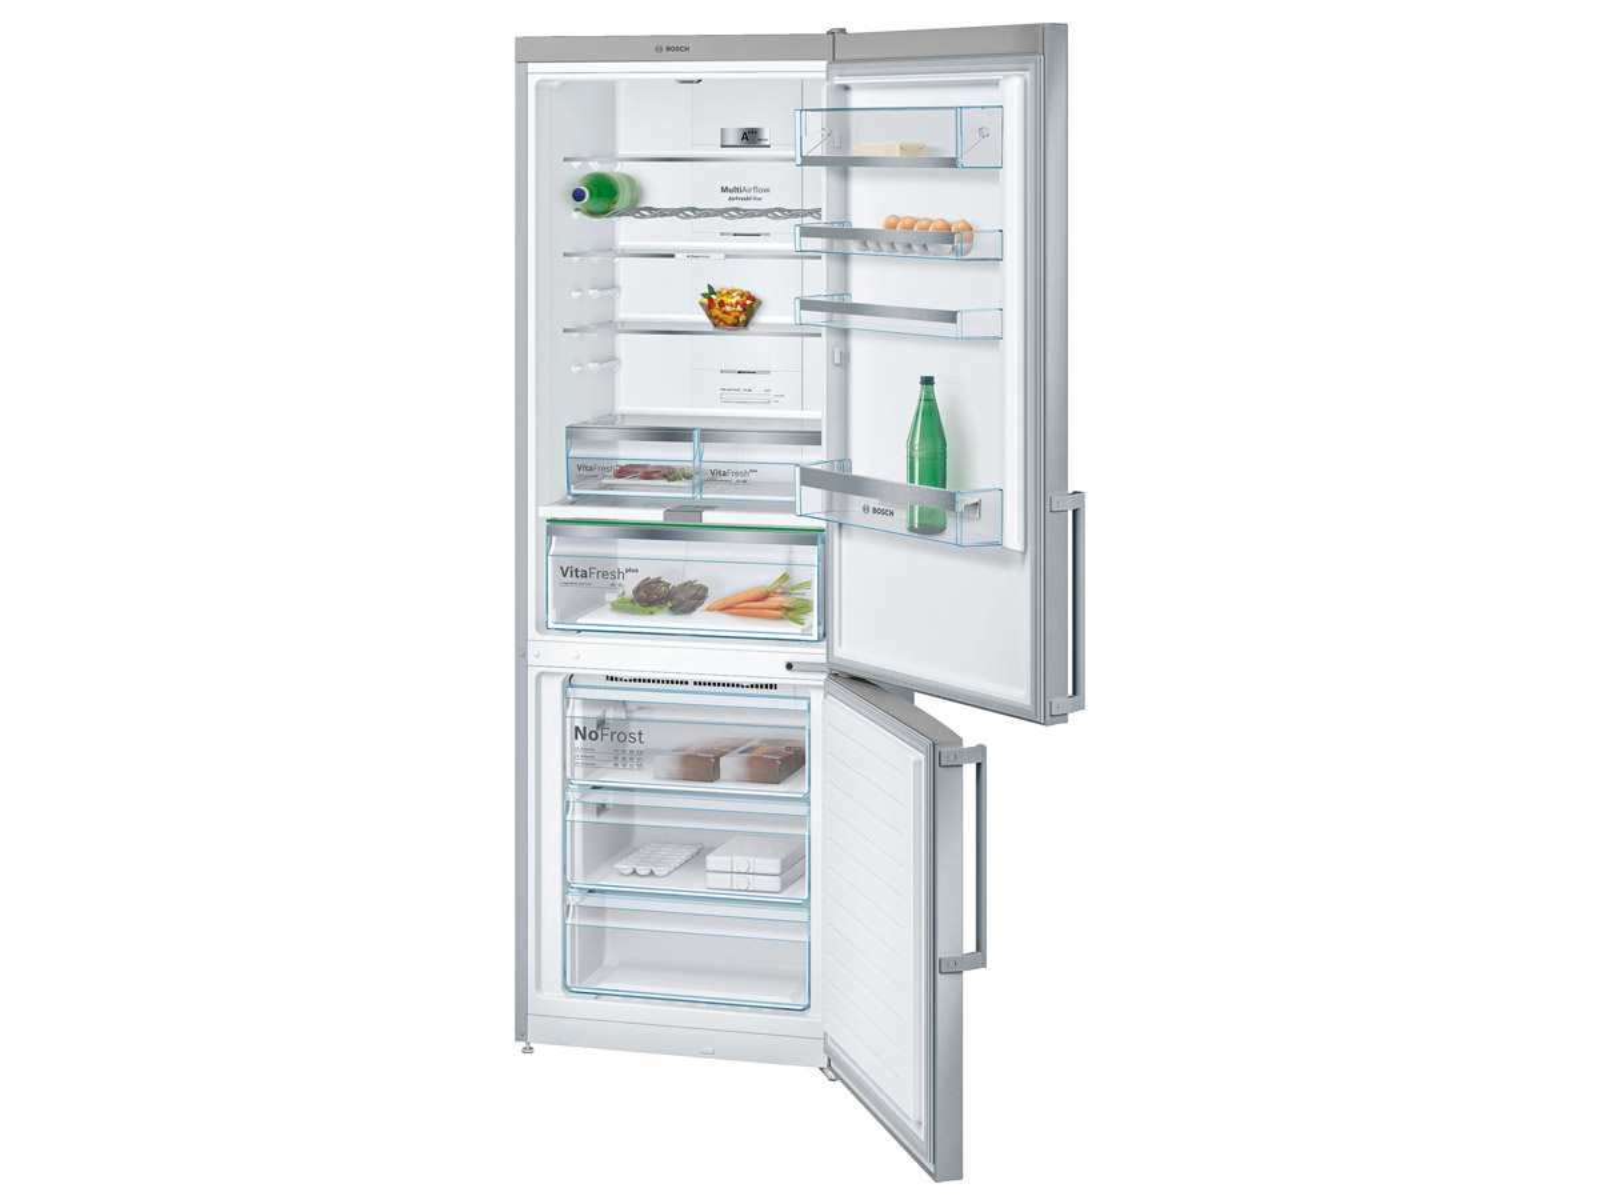 Bosch Kühlschrank Macht Komische Geräusche : Smeg kühlschrank laute geräusche siemens kühlschrank macht